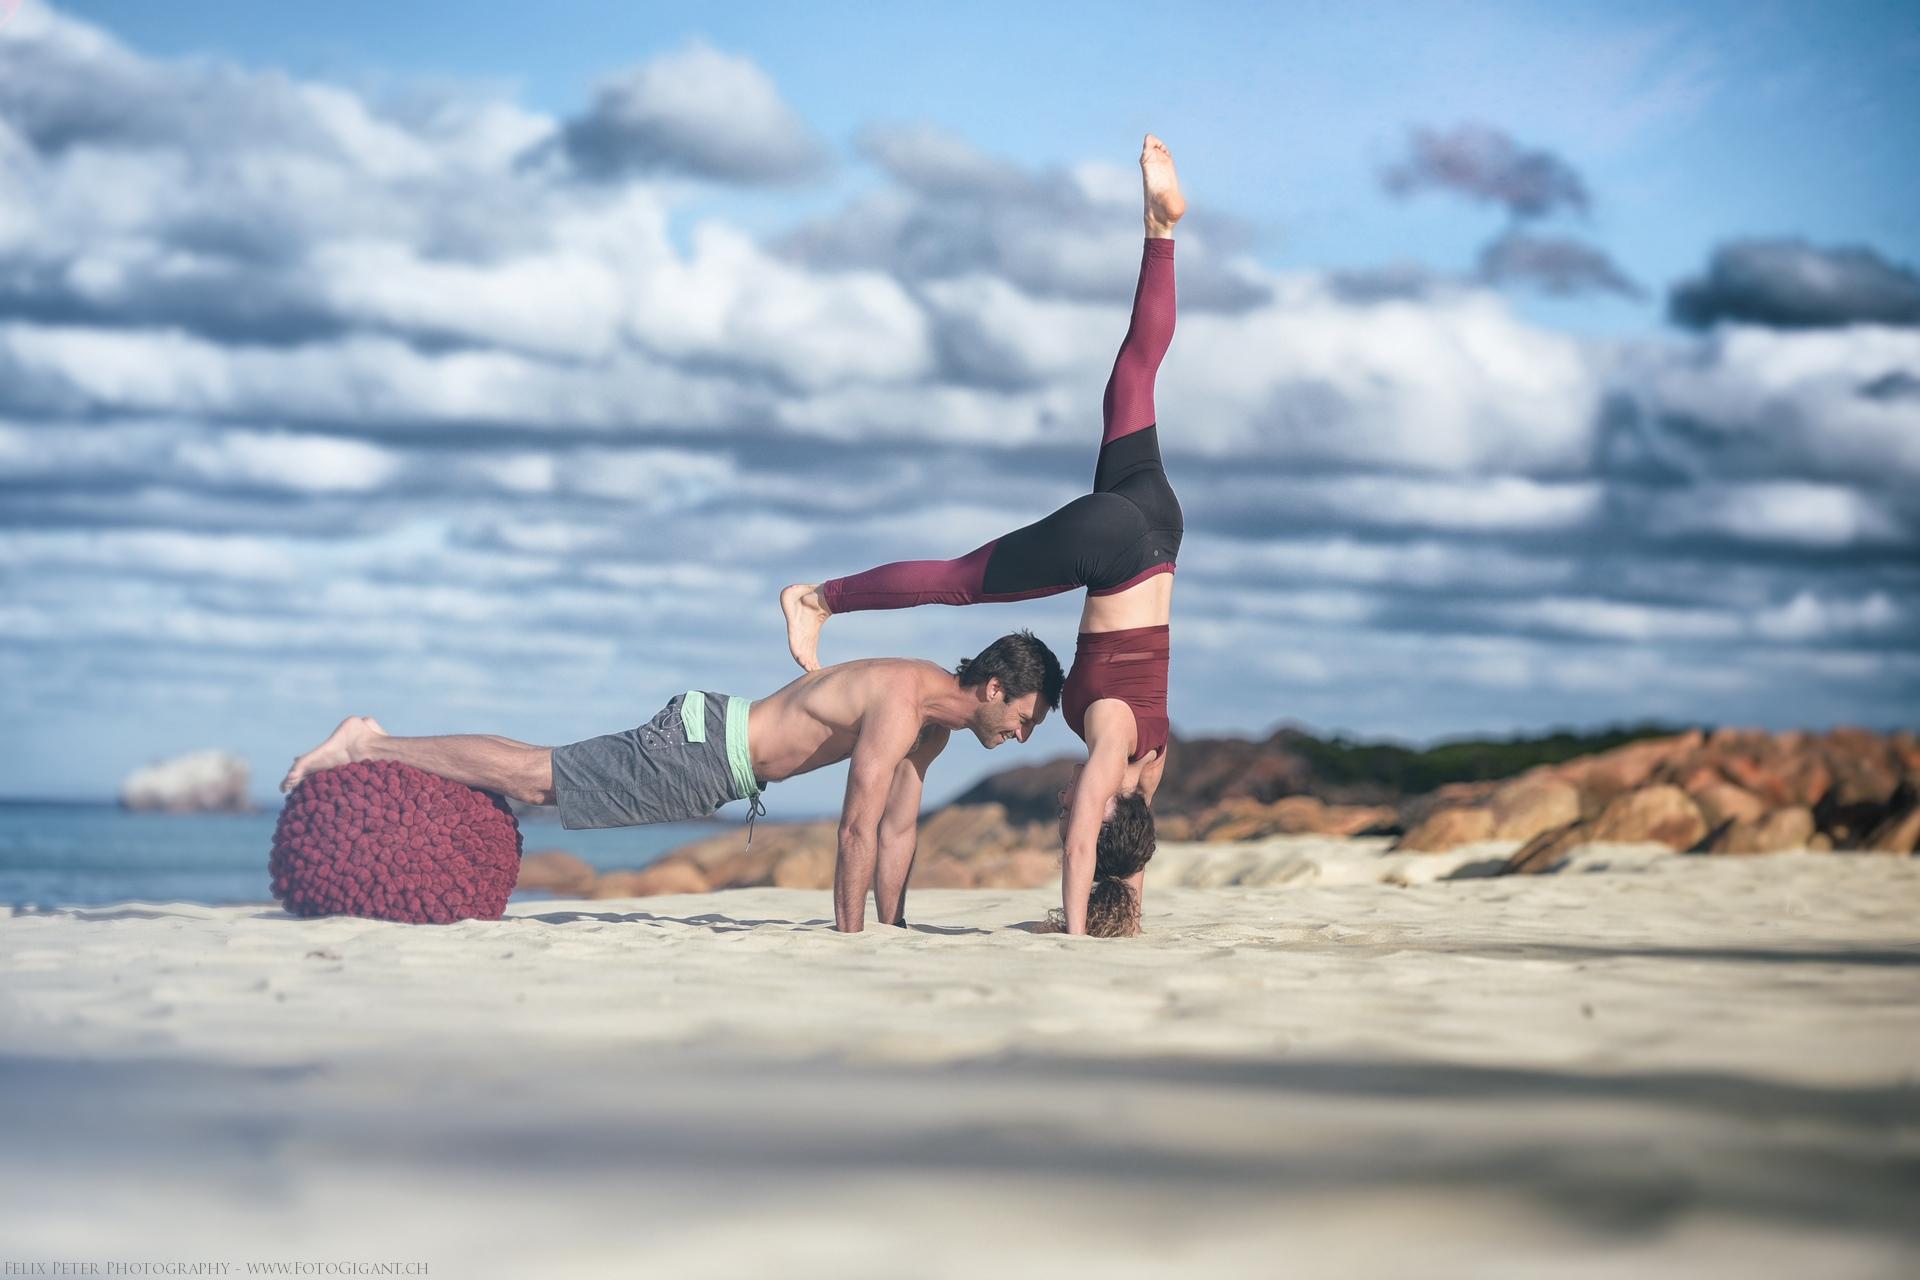 Felix-Peter-Yoga-Pilates-Dance-Fotografie_Bern_085.jpg